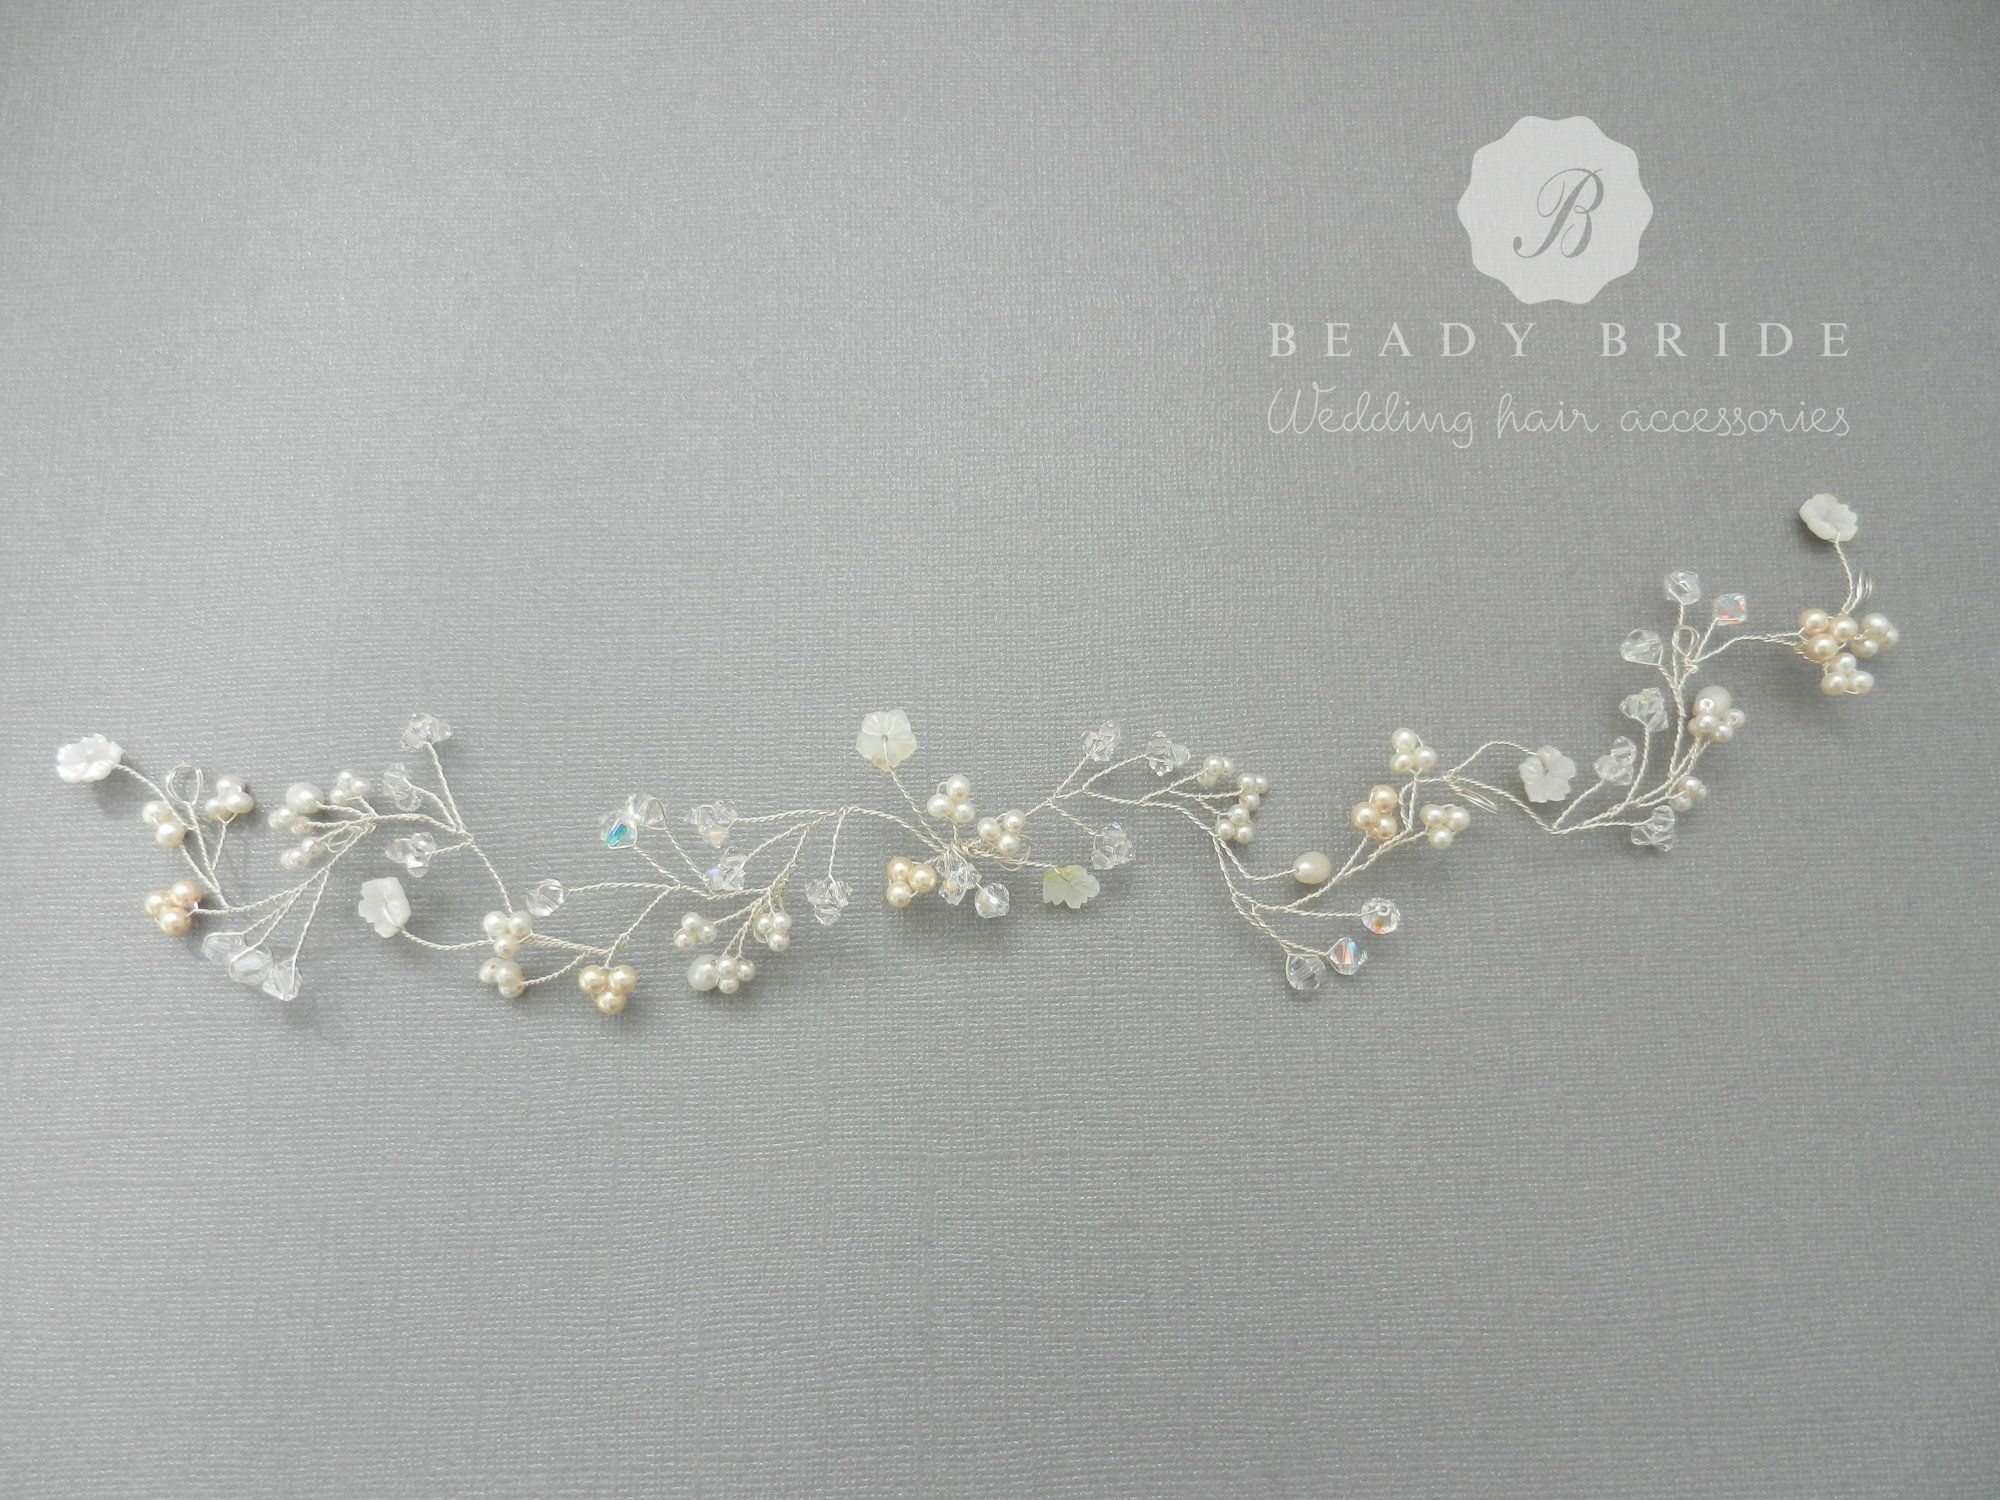 Anita-bridal-wedding- hair vine-by Beady Bride-UK (1)